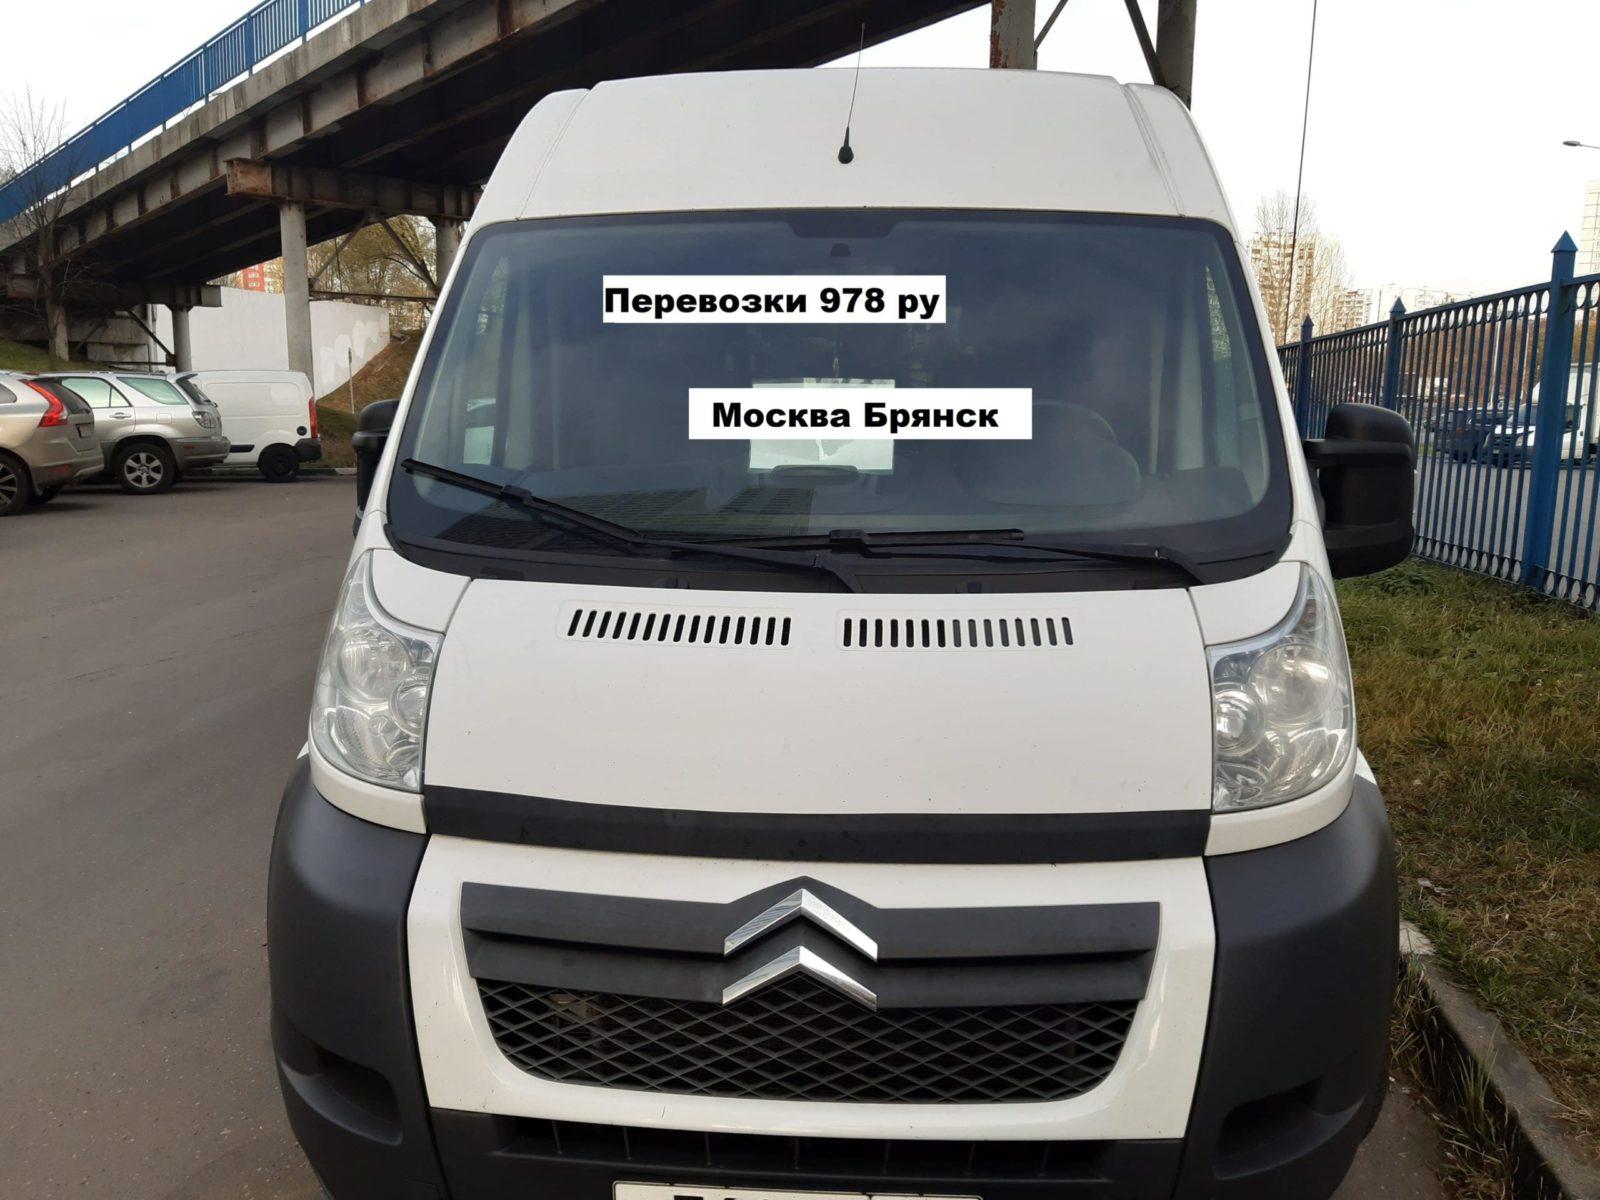 Аренда микроавтобуса, перевозки Москва Брянск людей и грузов | «Перевозки 978»